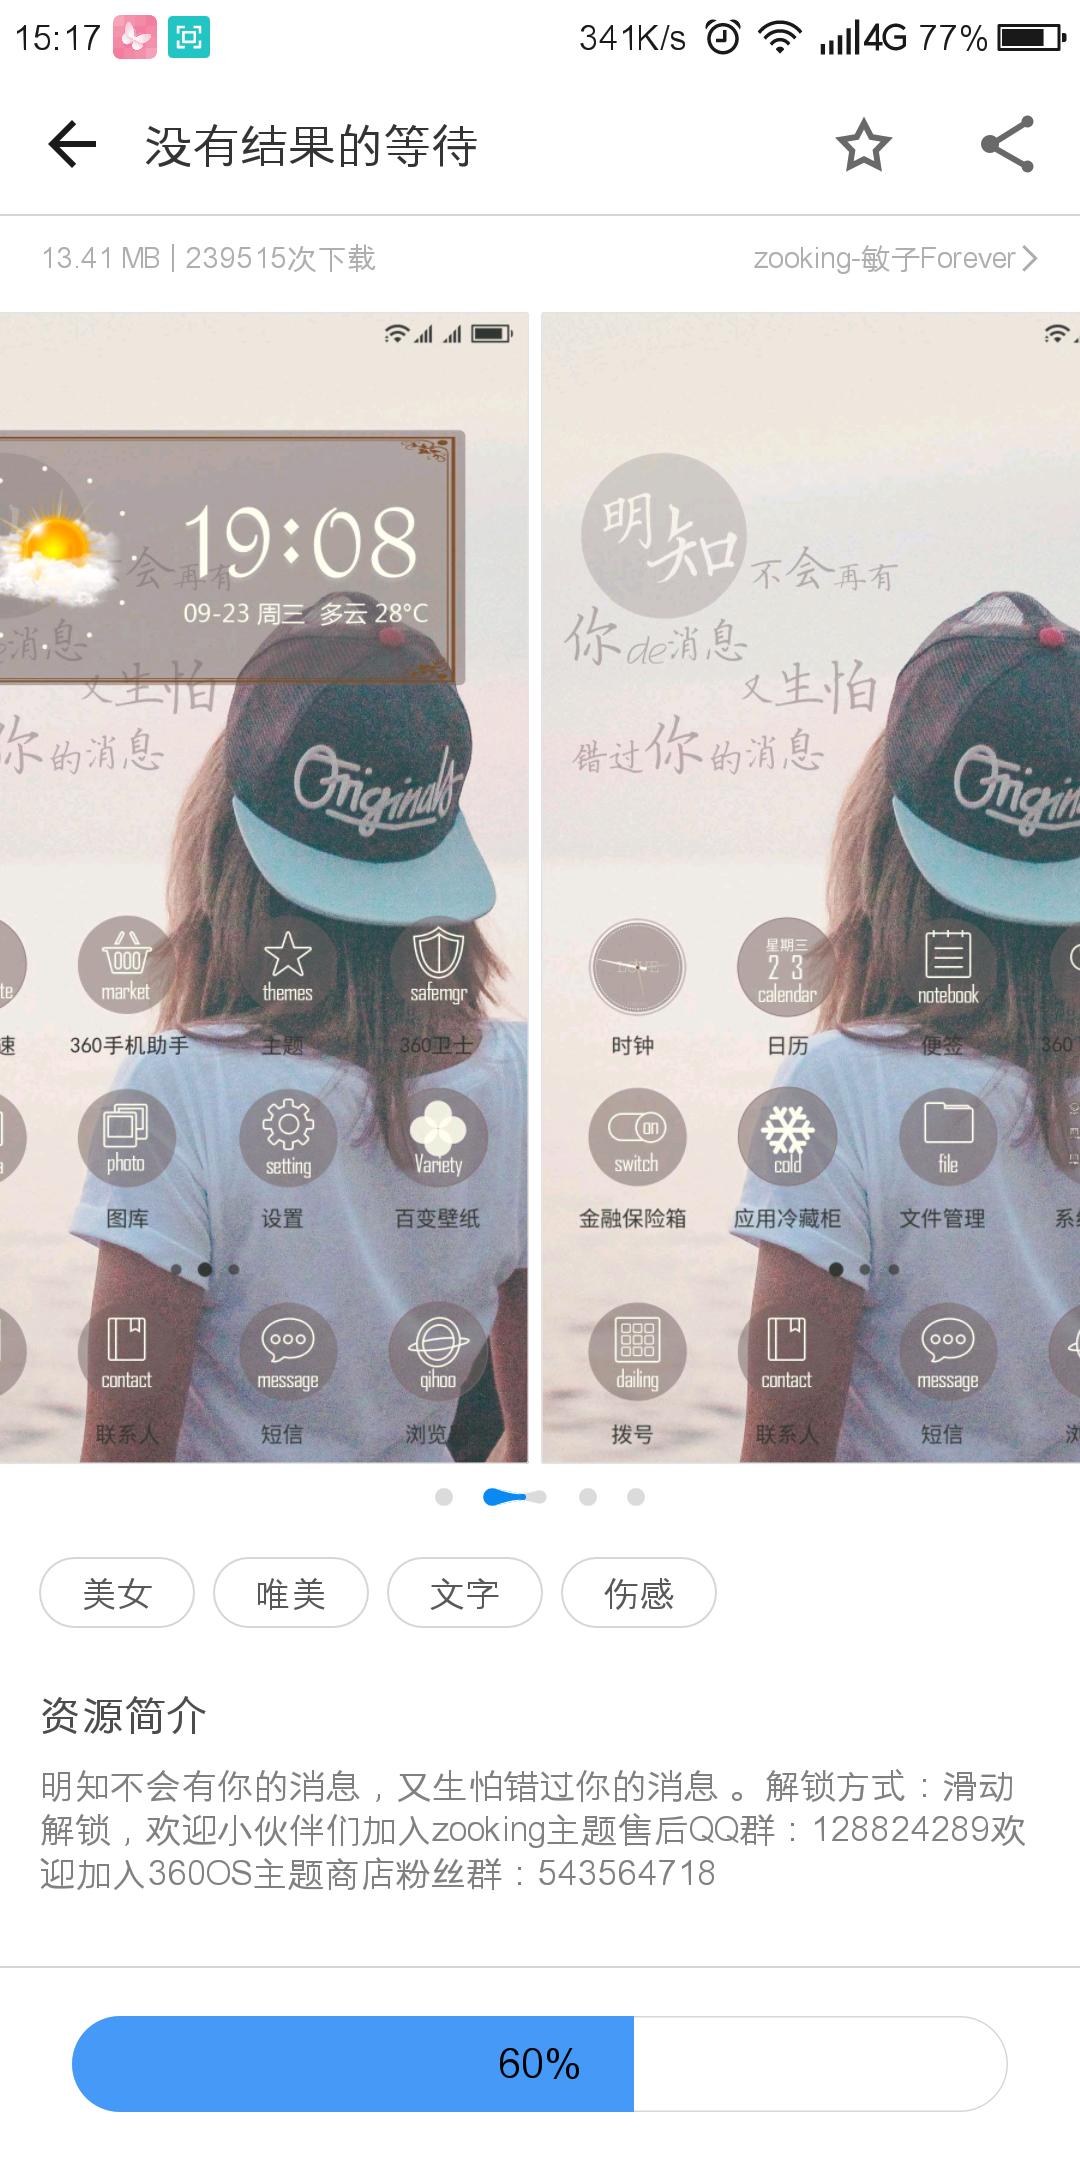 Screenshot_2018-10-30-15-17-20.png